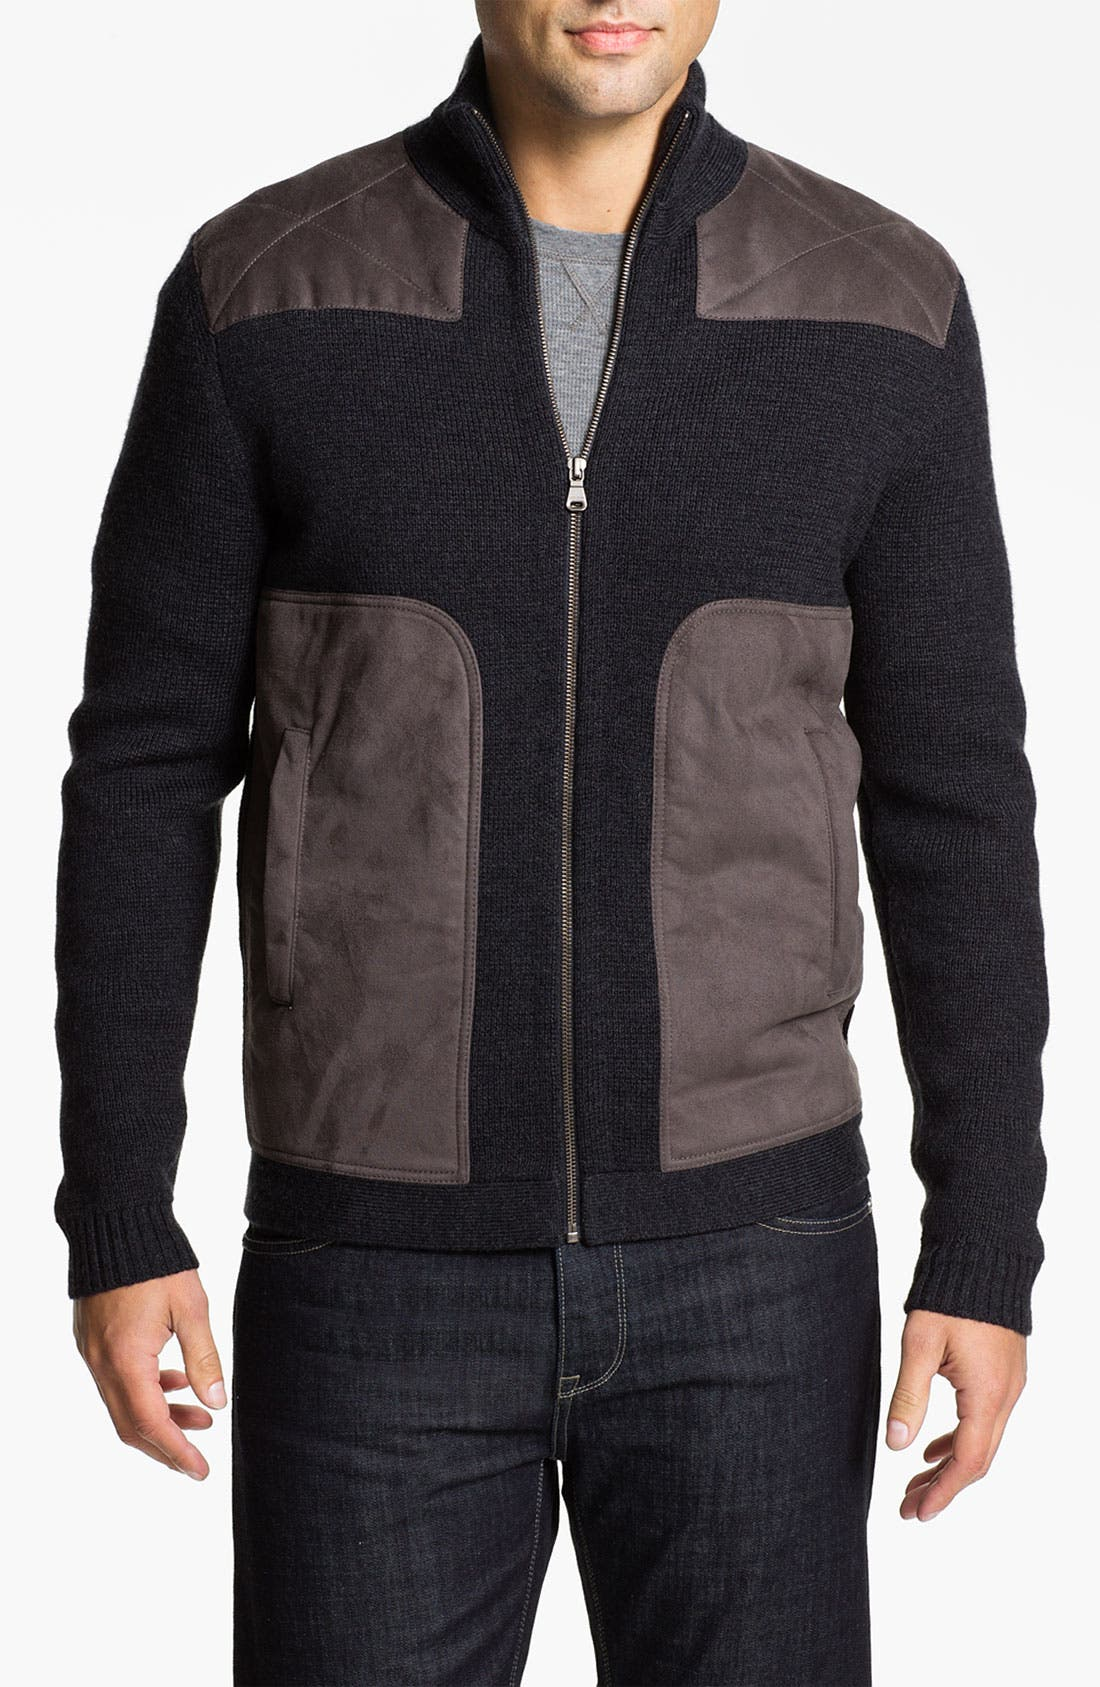 Alternate Image 1 Selected - BOSS Black 'Laurin' Wool Blend Zip Cardigan with Suede Trim